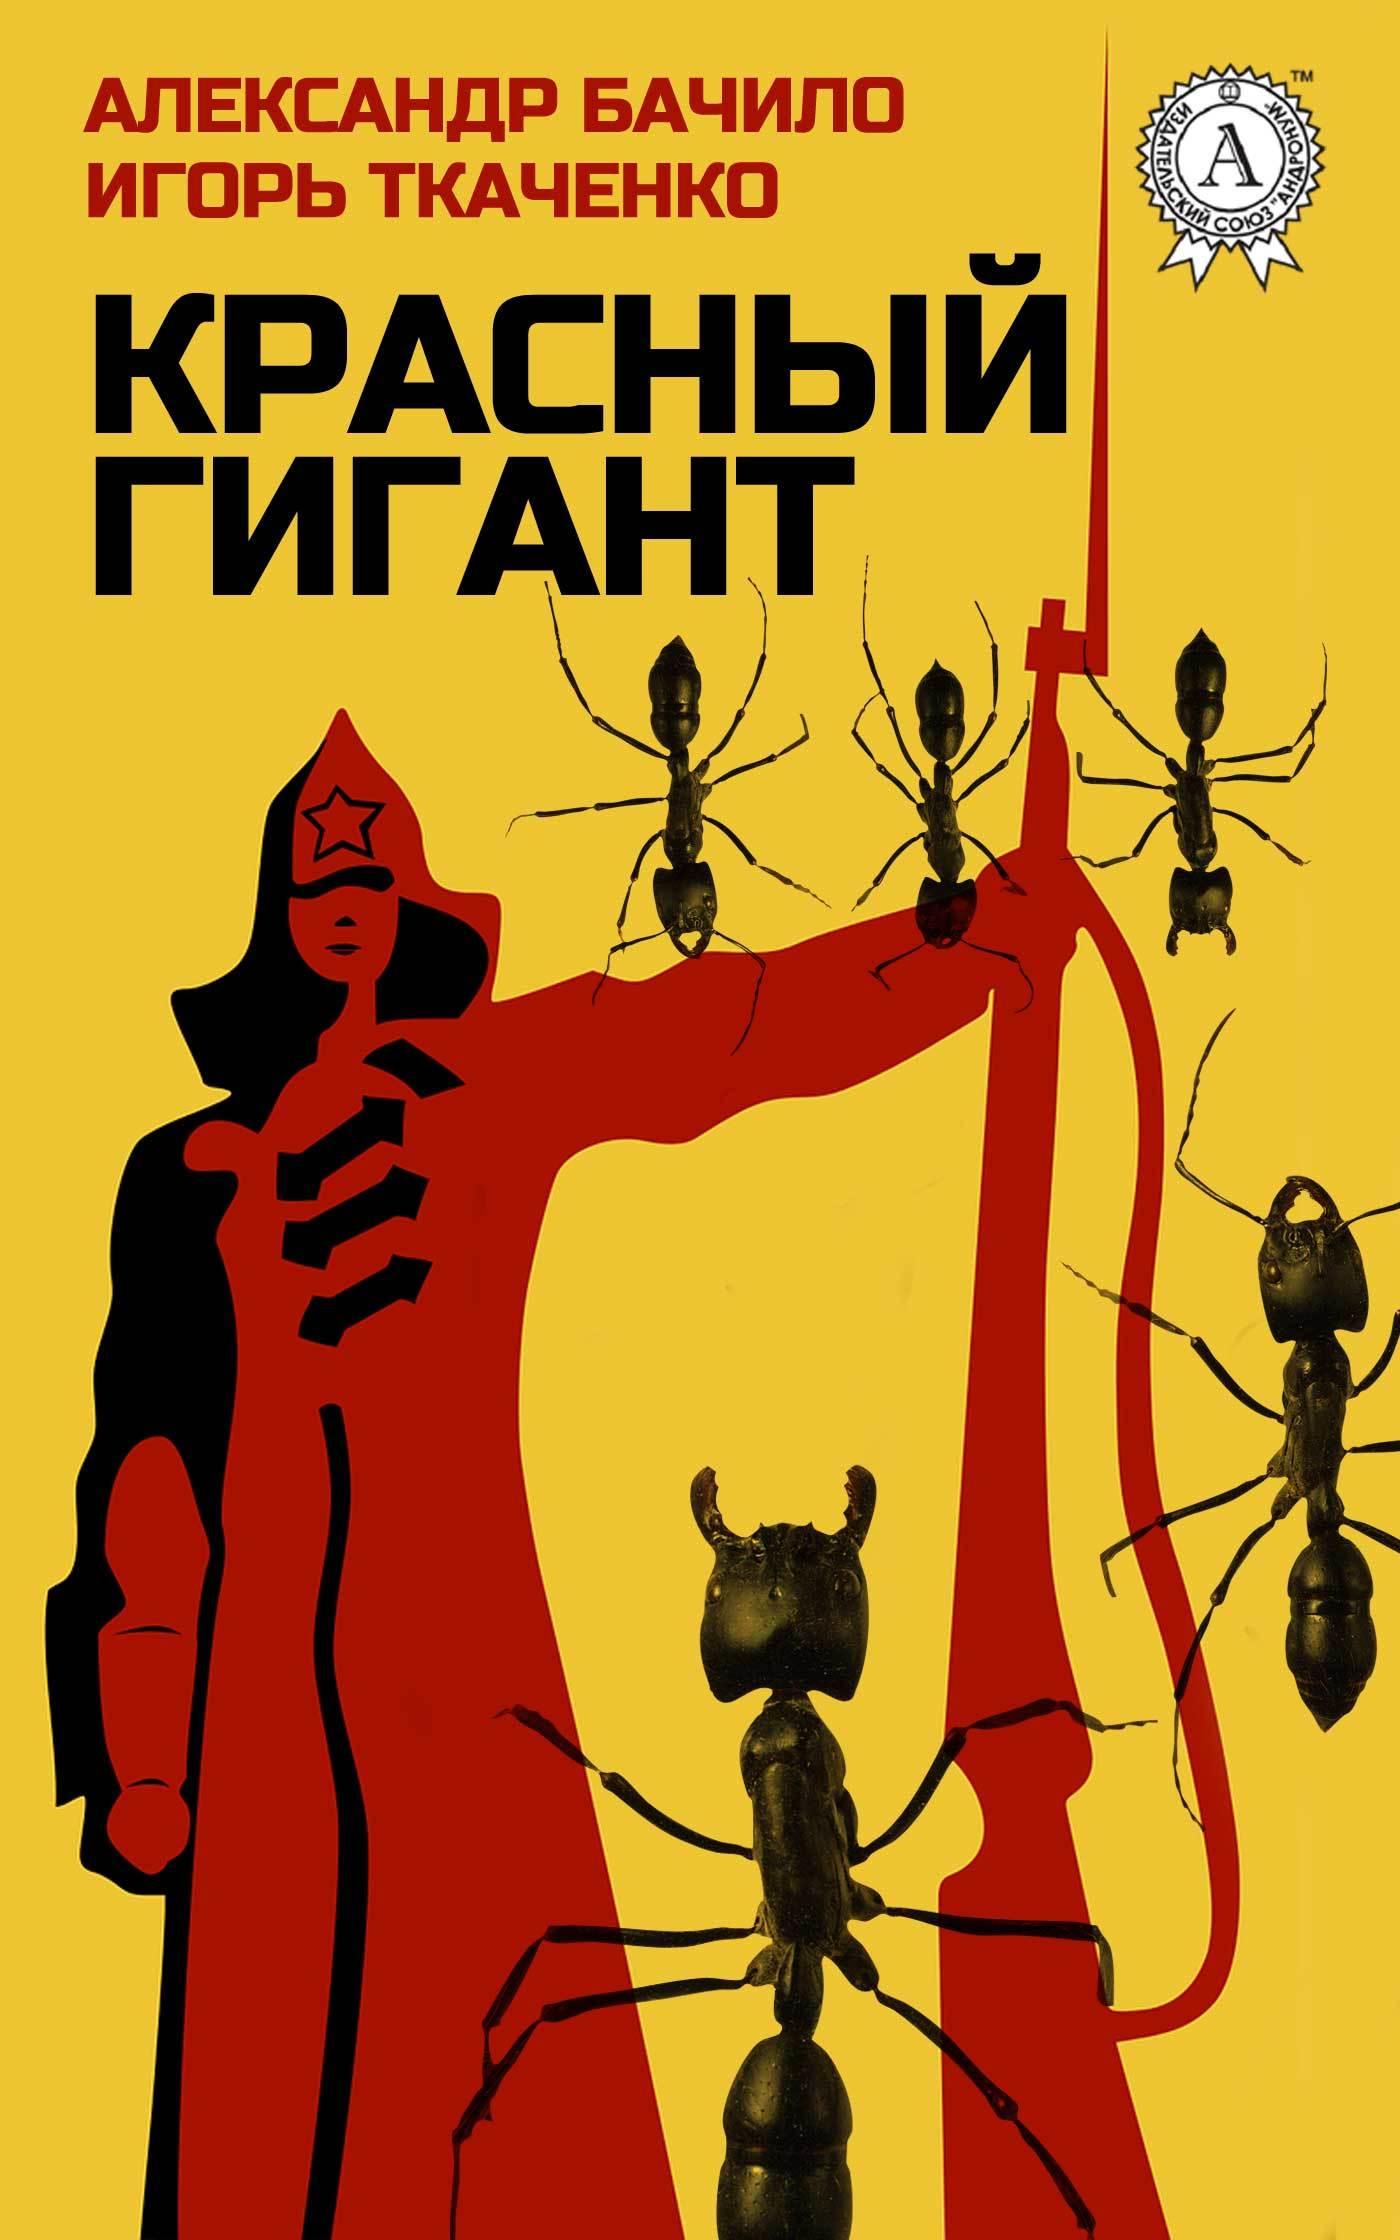 Игорь Ткаченко, Александр Бачило - Красный Гигант